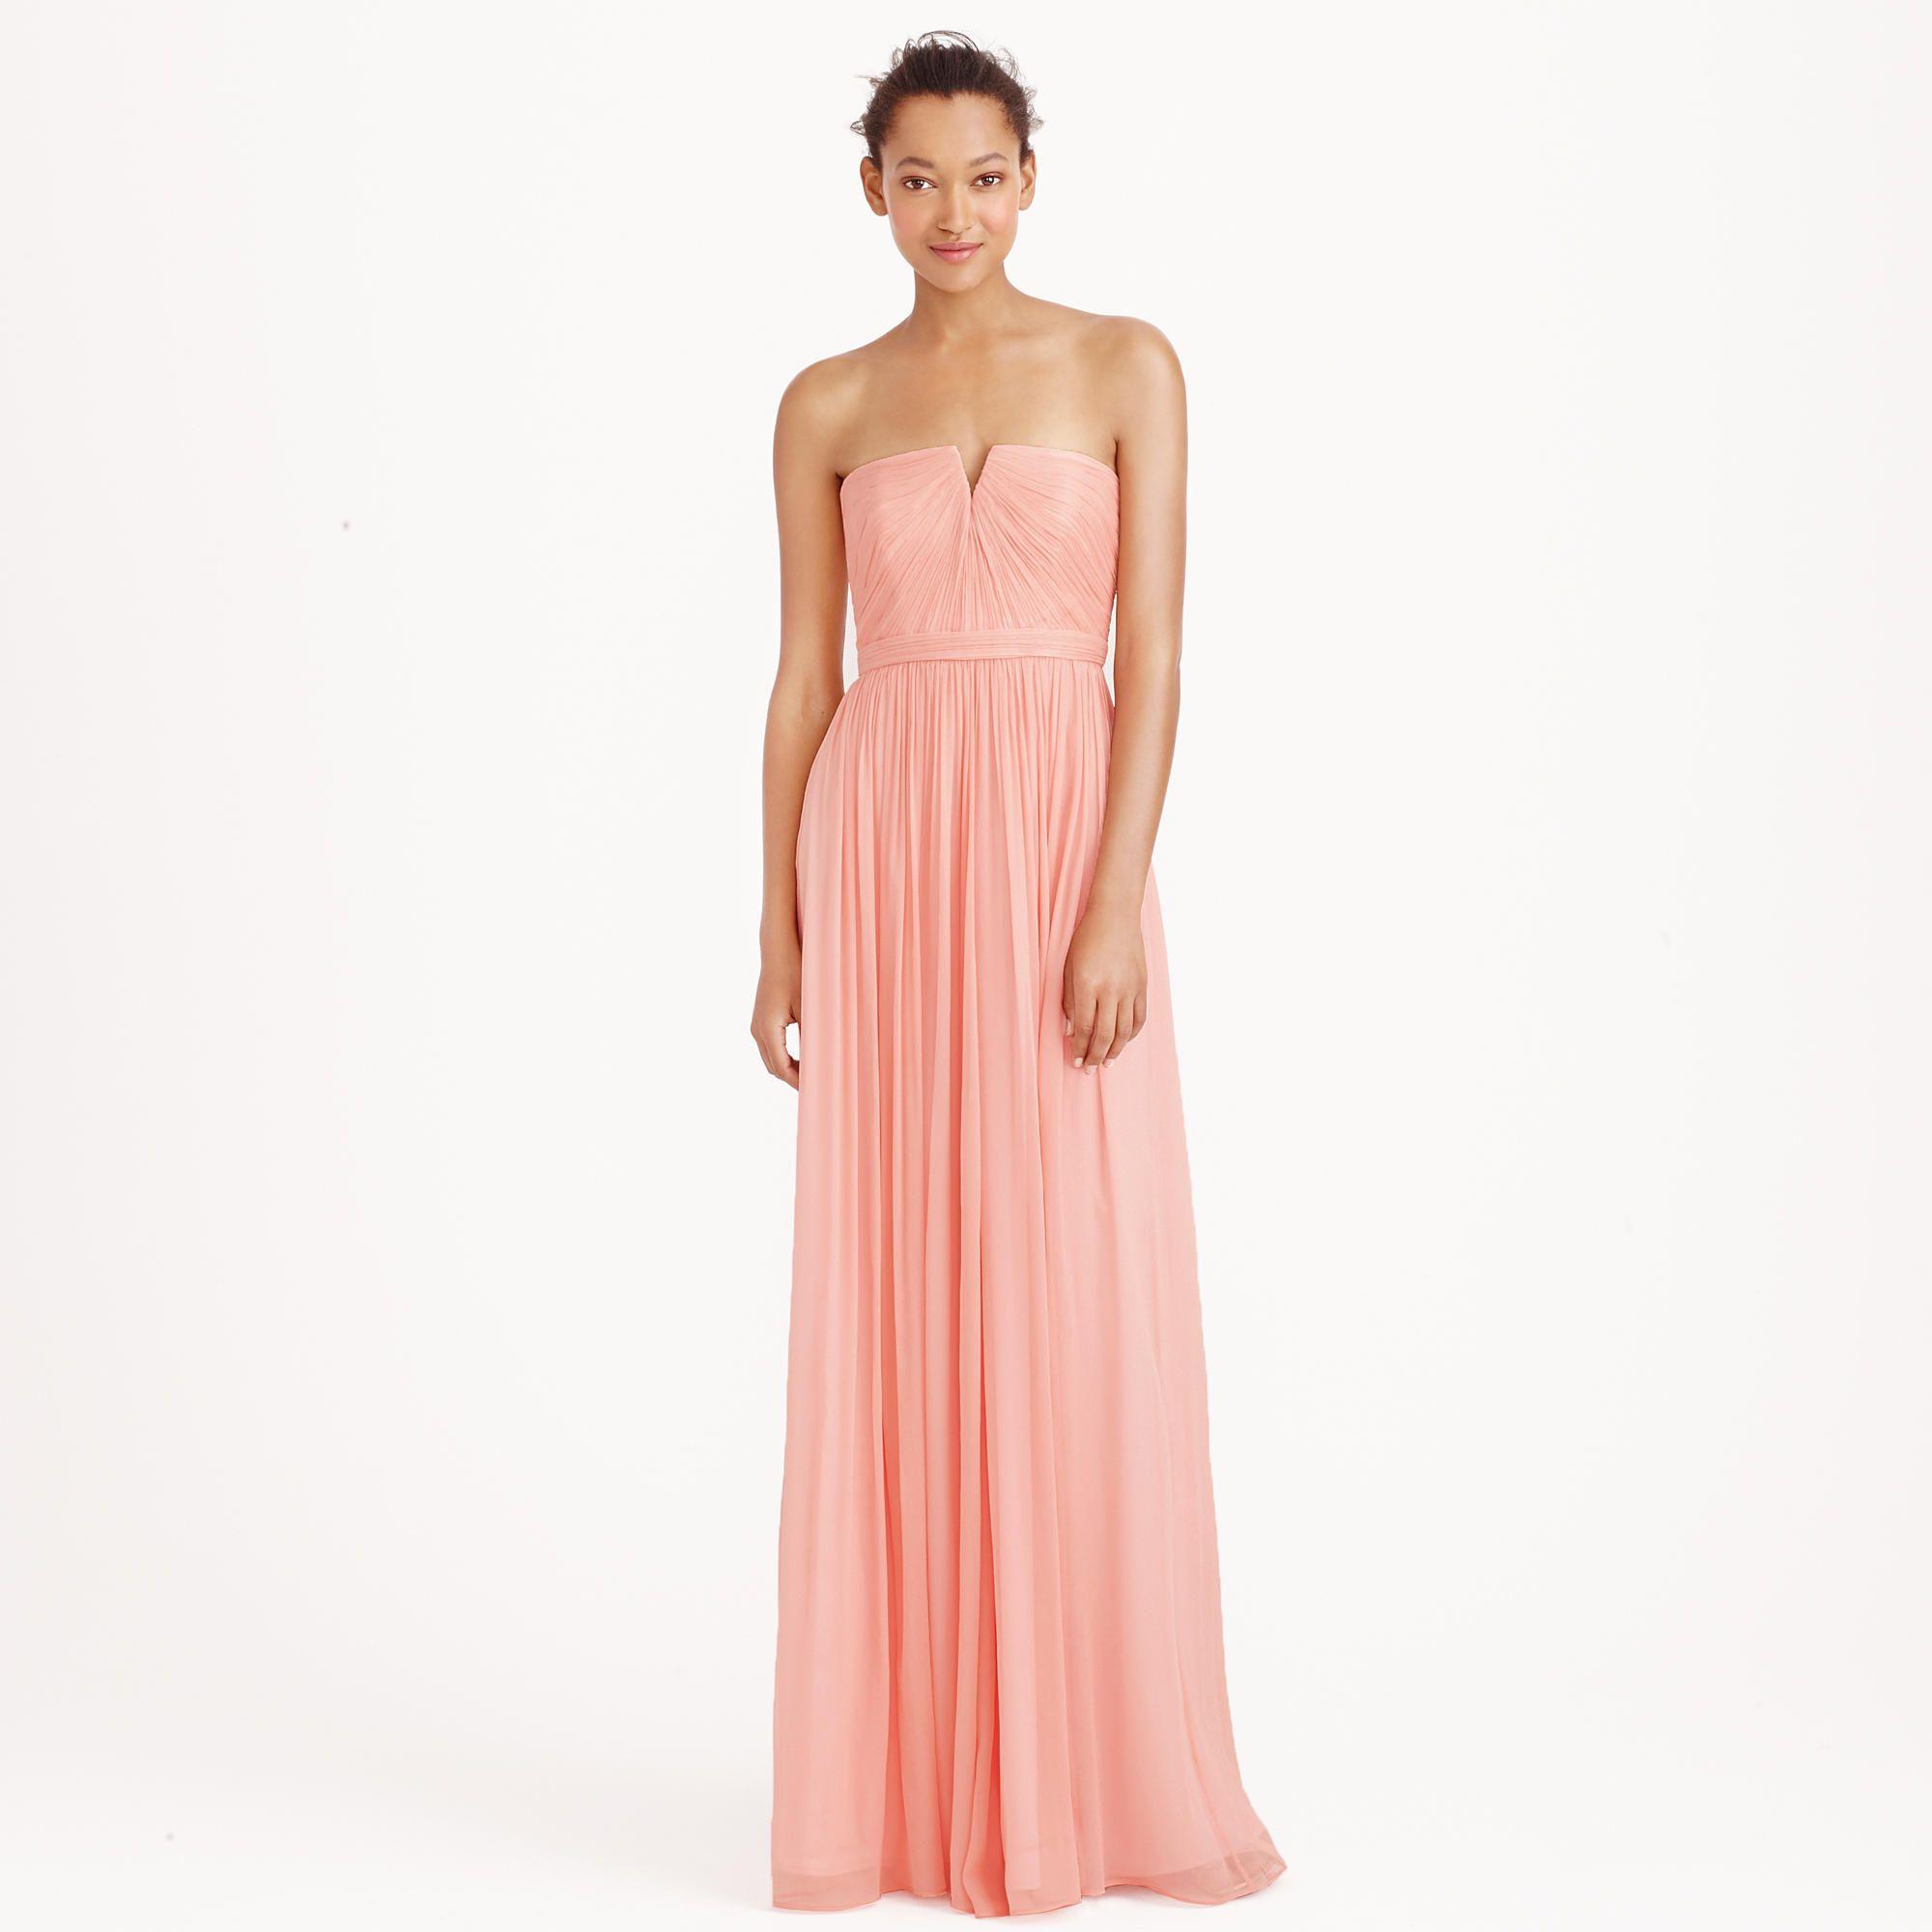 Petite Nadia long dress in silk chiffon : AllProducts | J.Crew ...